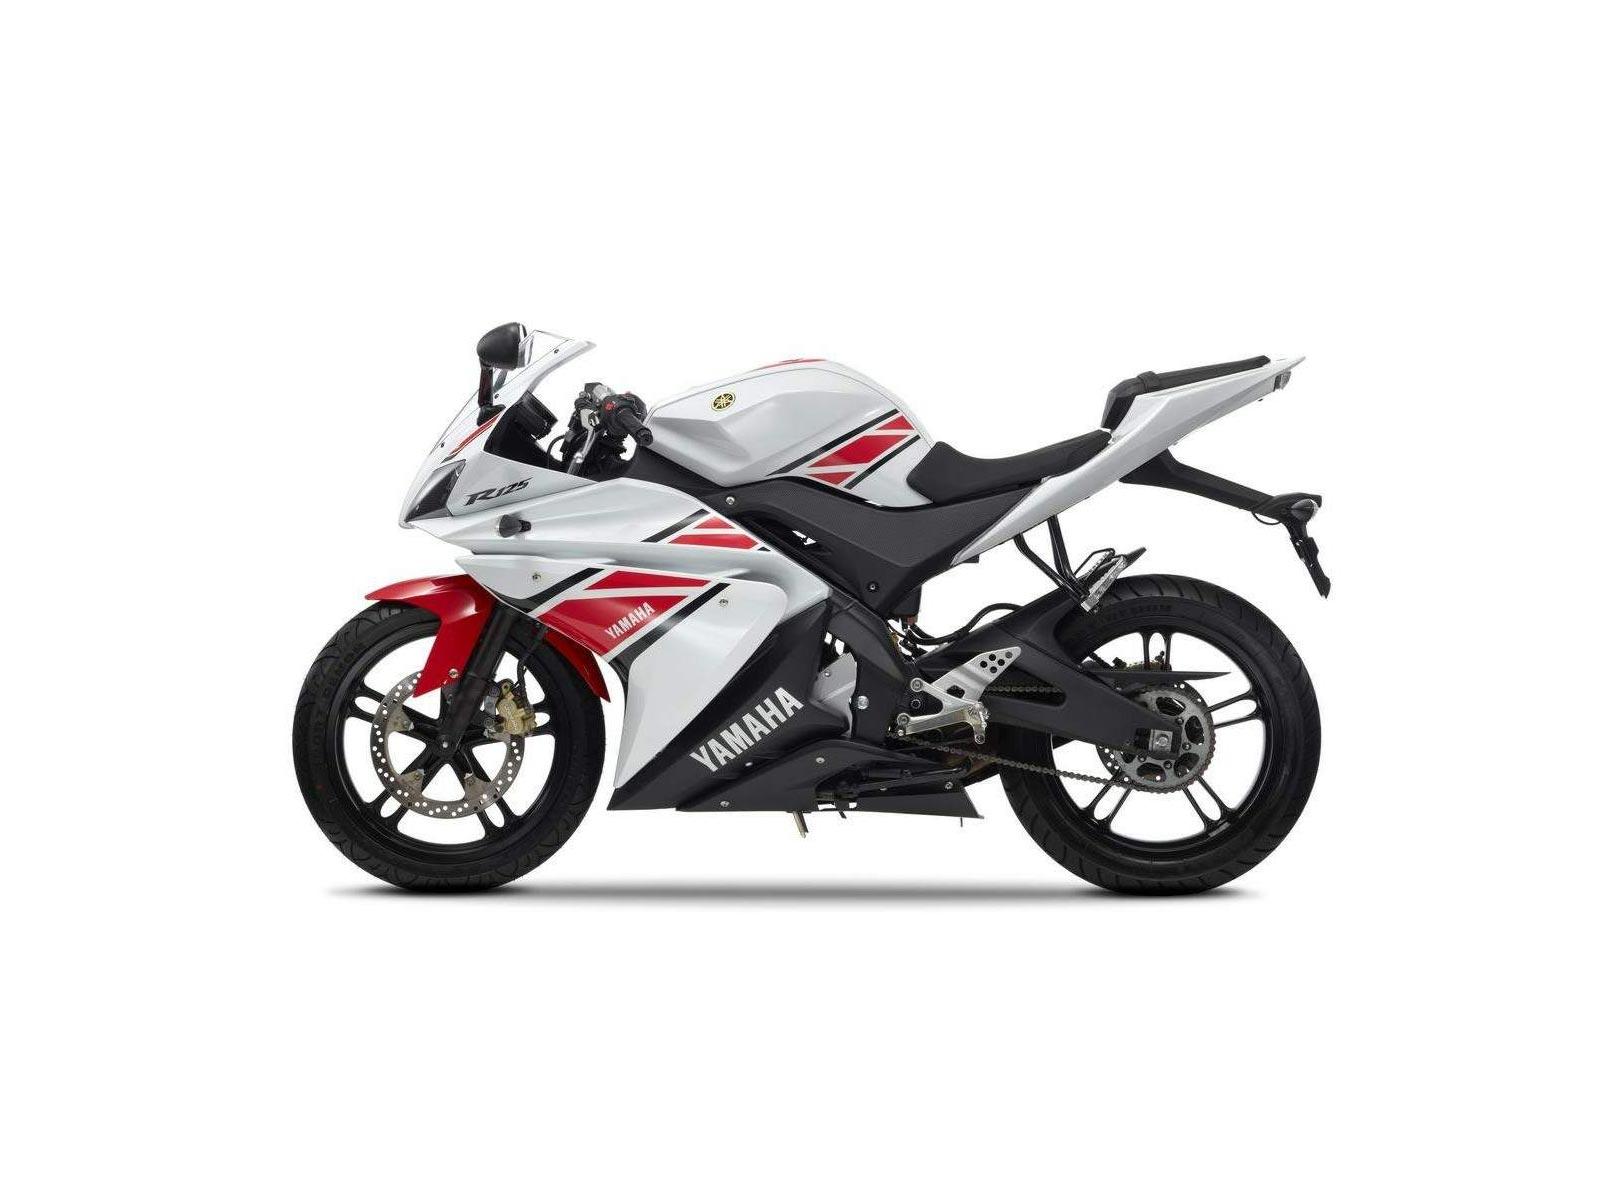 Yamaha 250cc sport bike confirmed for india asphalt rubber for Yamaha motor finance usa login